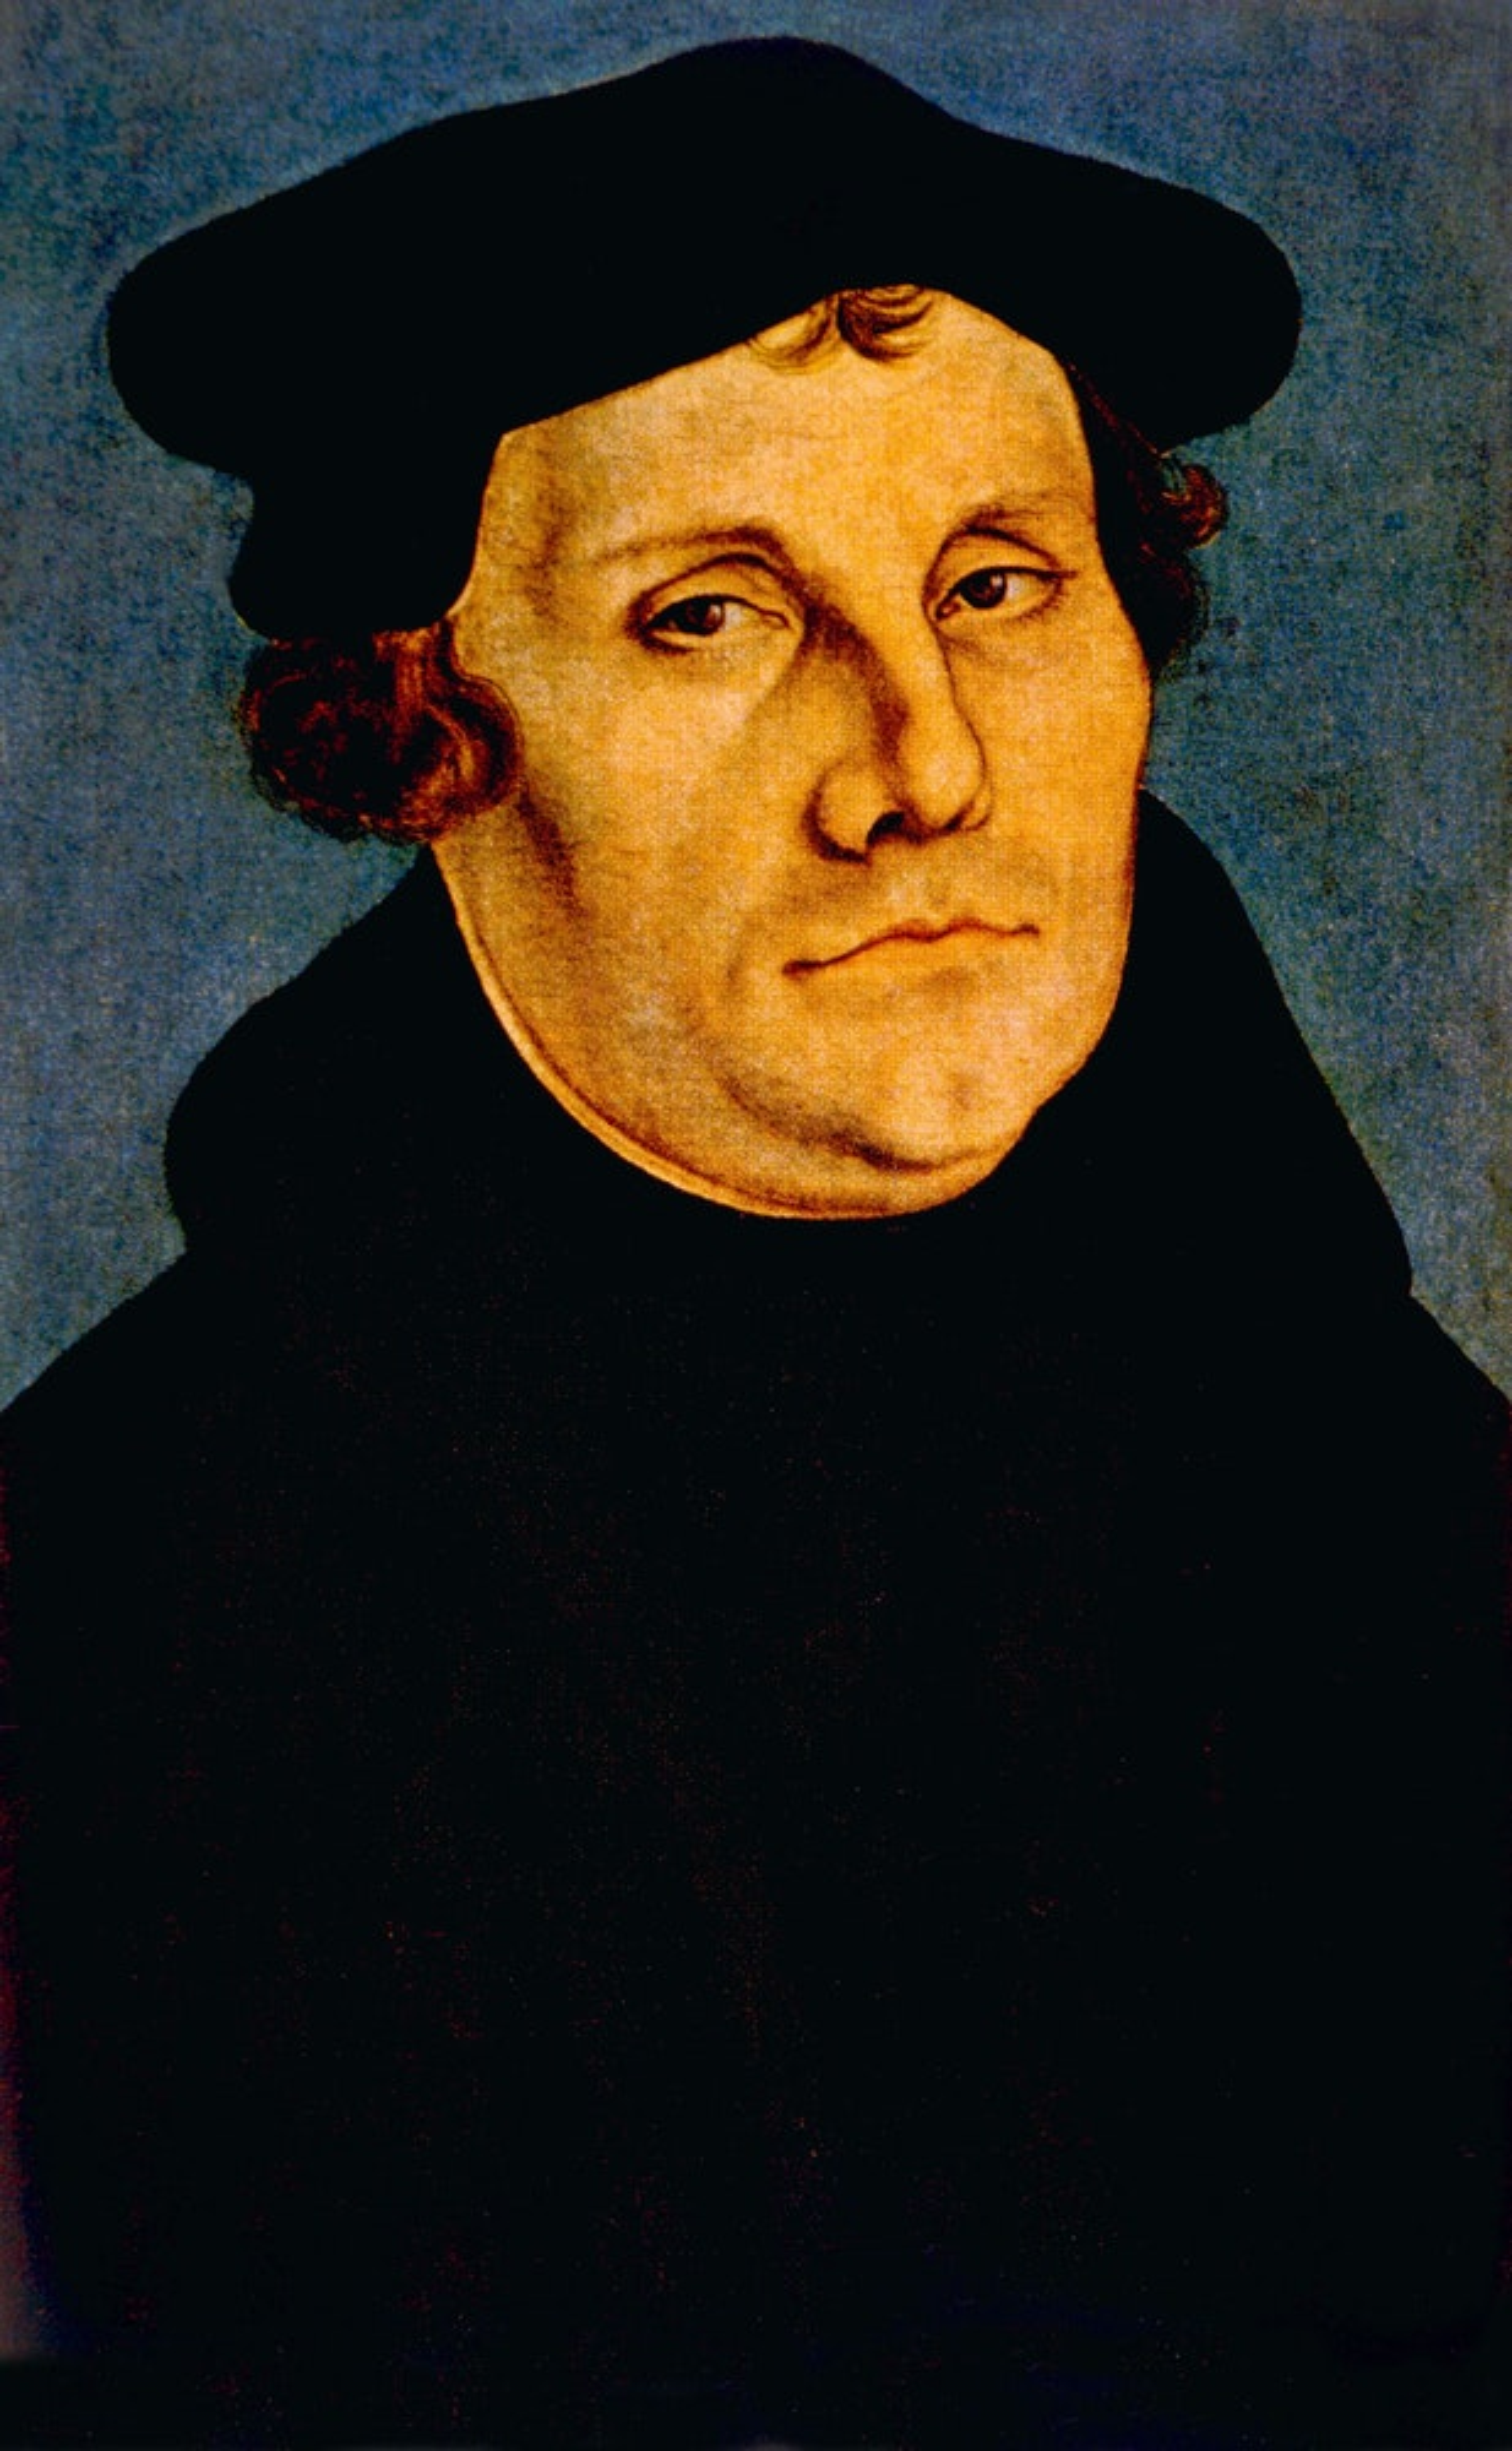 Martin Luther portrait by Lucas Cranach, 1529. Shutterstock/EverettHistorical